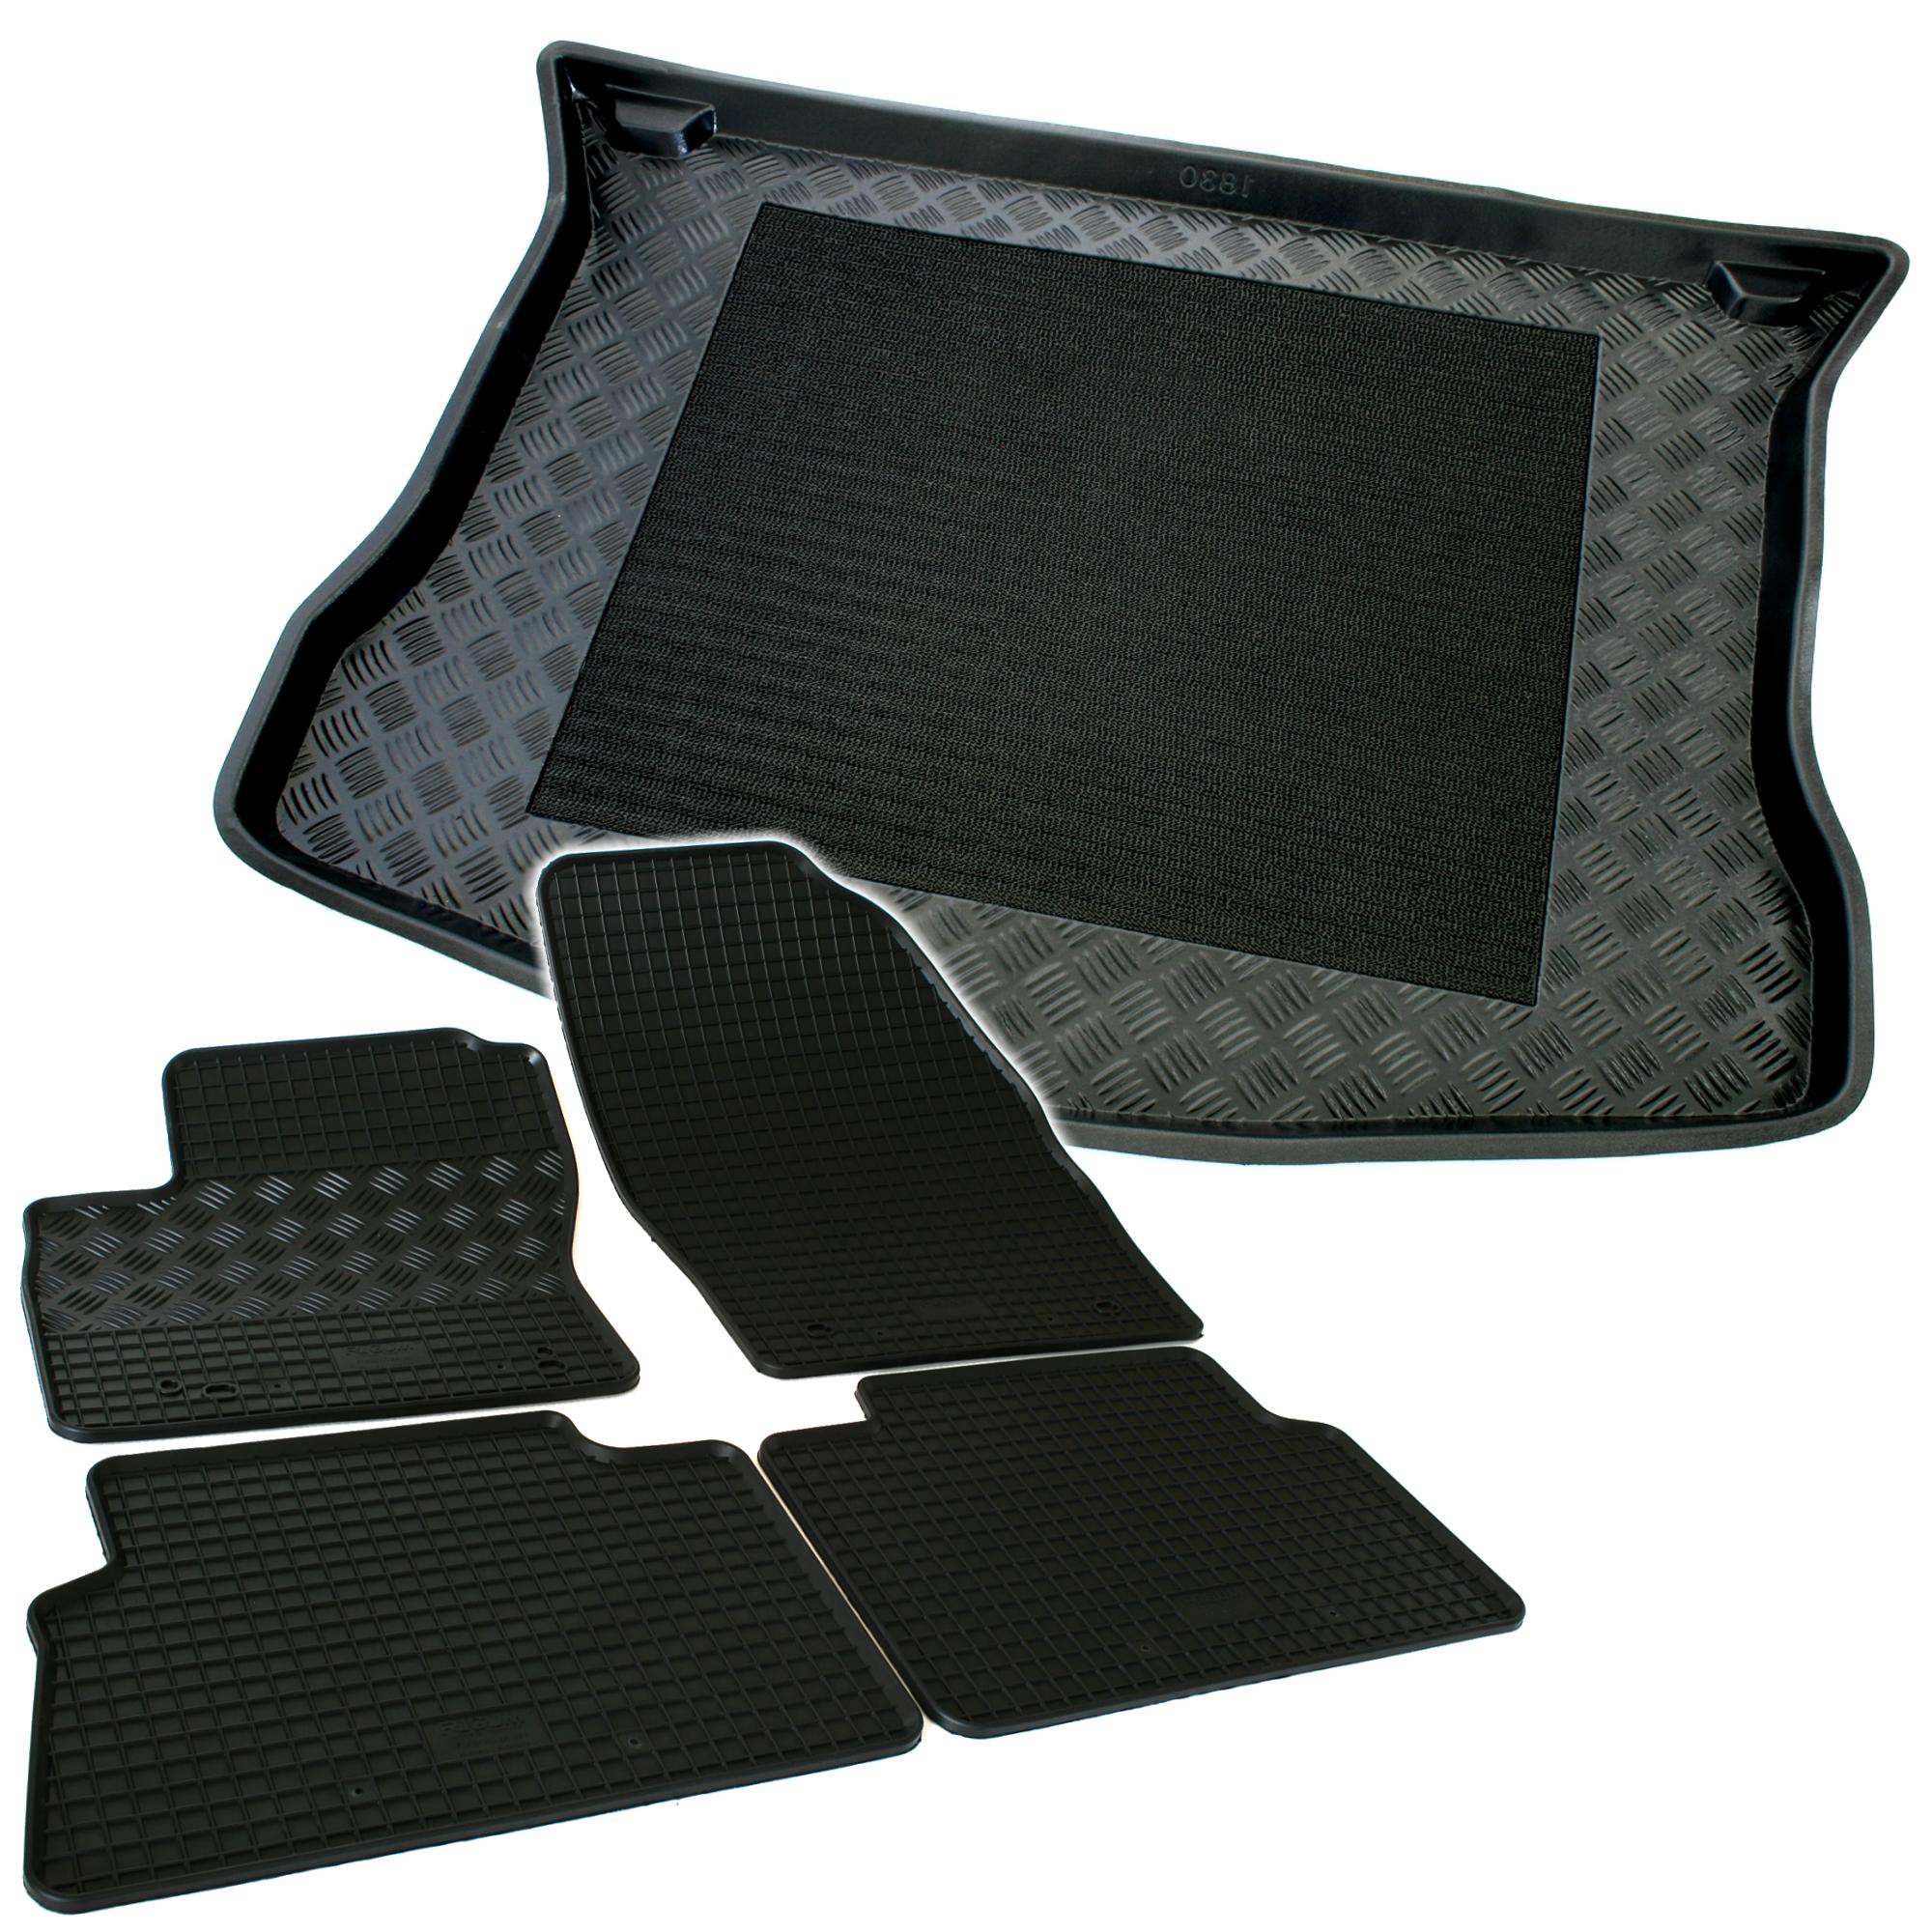 kofferraumwanne gummimatten f r ford kuga 1 08 03 gummi fu matten wanne matten ebay. Black Bedroom Furniture Sets. Home Design Ideas